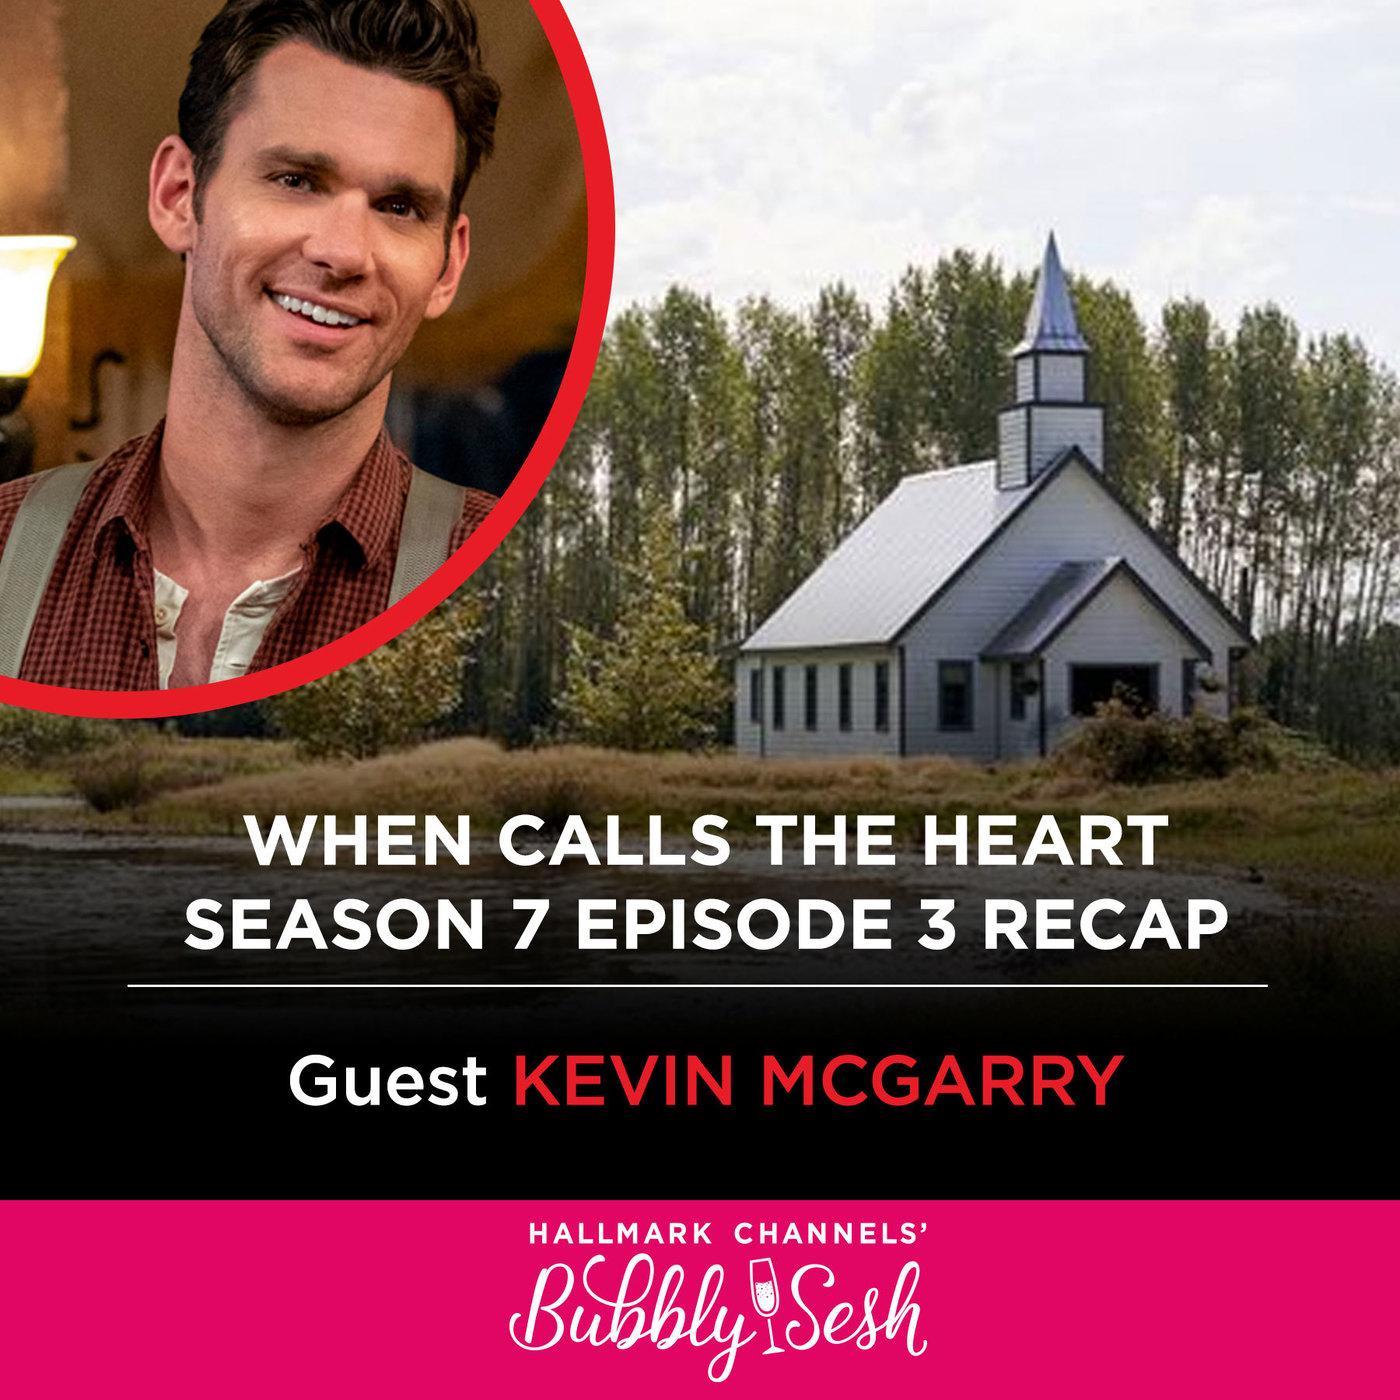 When Calls The Heart Season 7, Episode 3 Recap with Guest Kevin McGarry, Actor